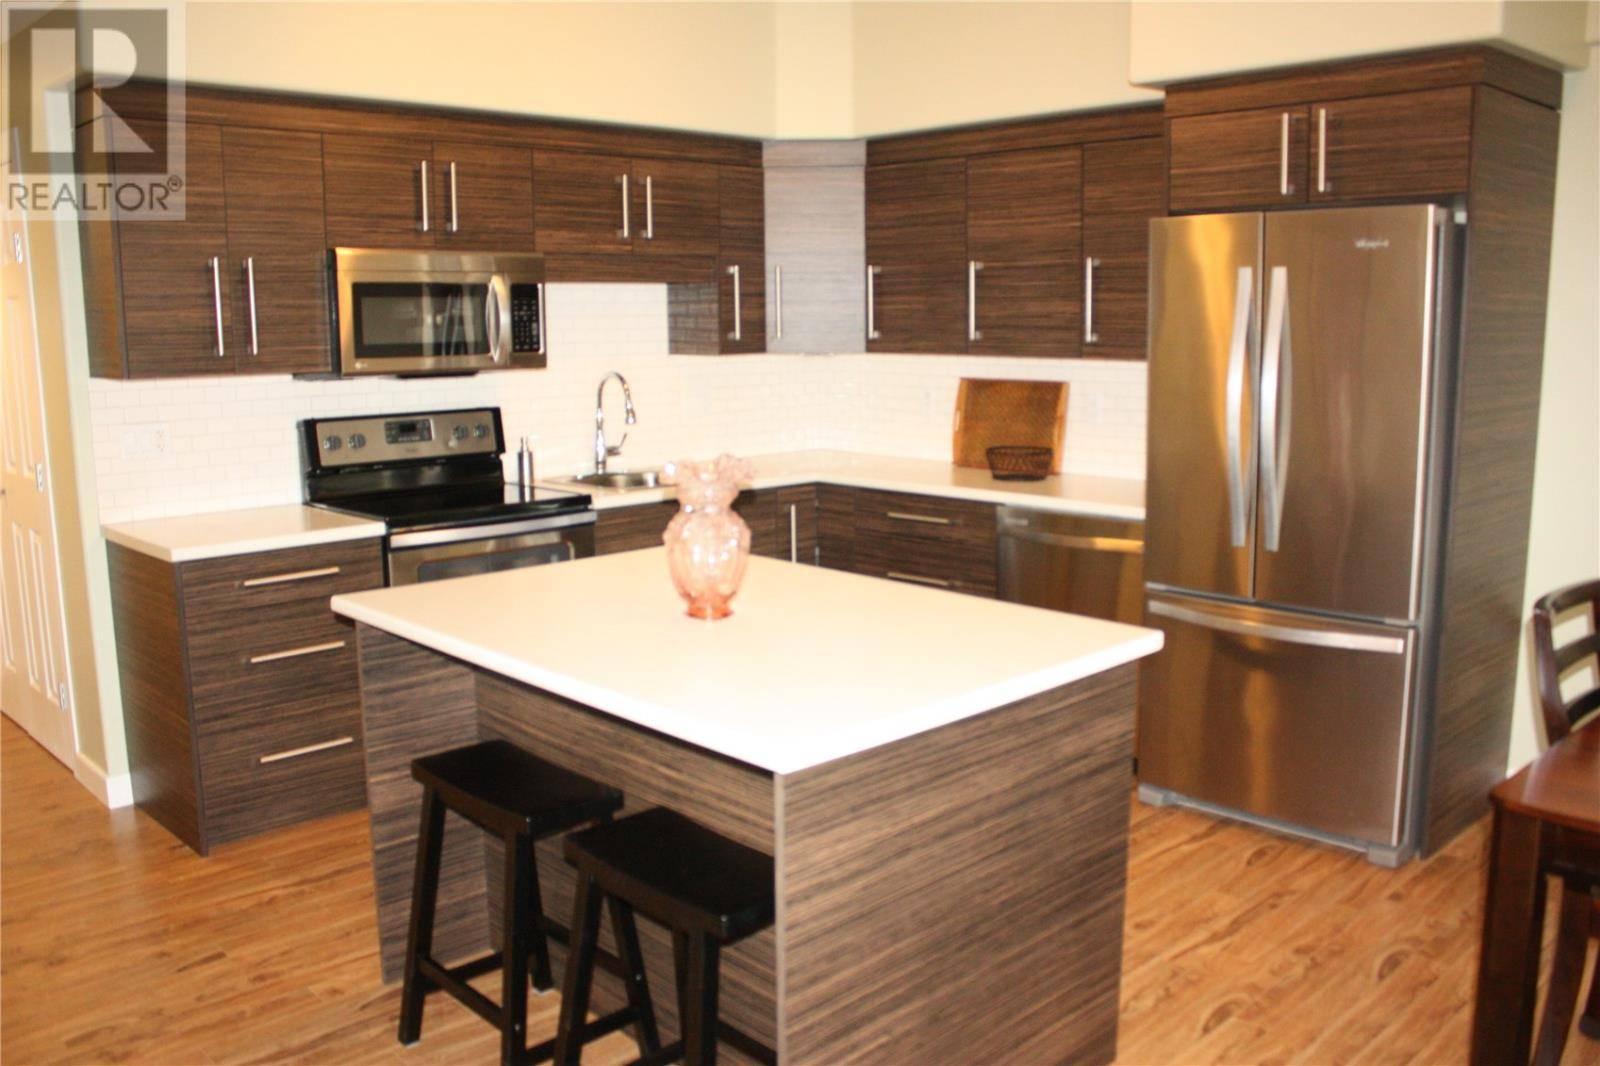 Condo for sale at 220 Mccallum Ave Unit 205 Birch Hills Saskatchewan - MLS: SK767244